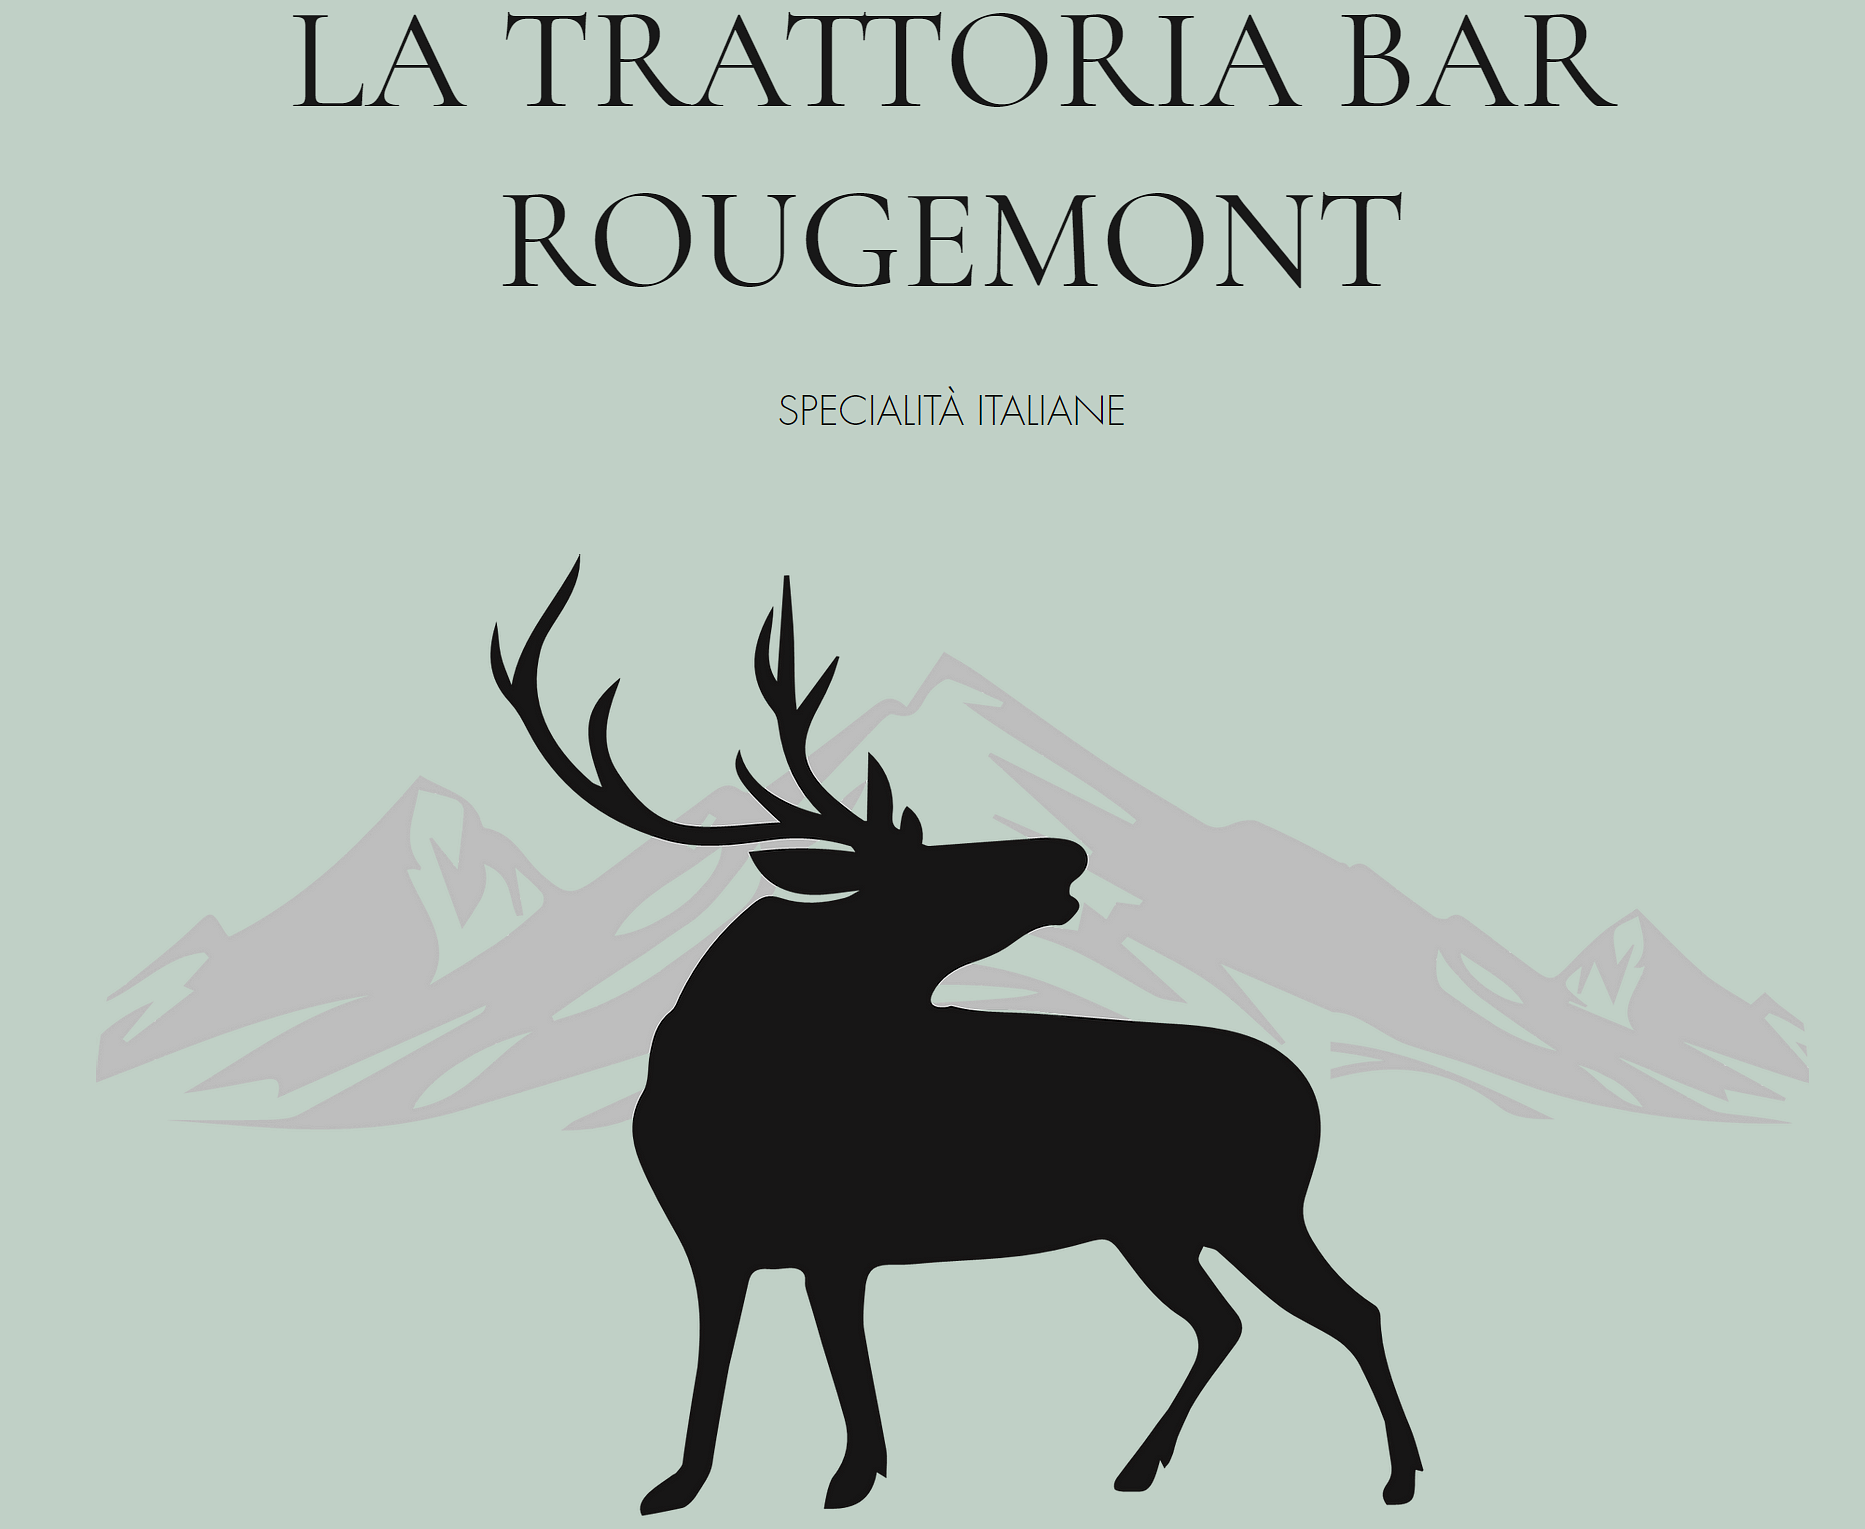 La Trattoria Rougemont